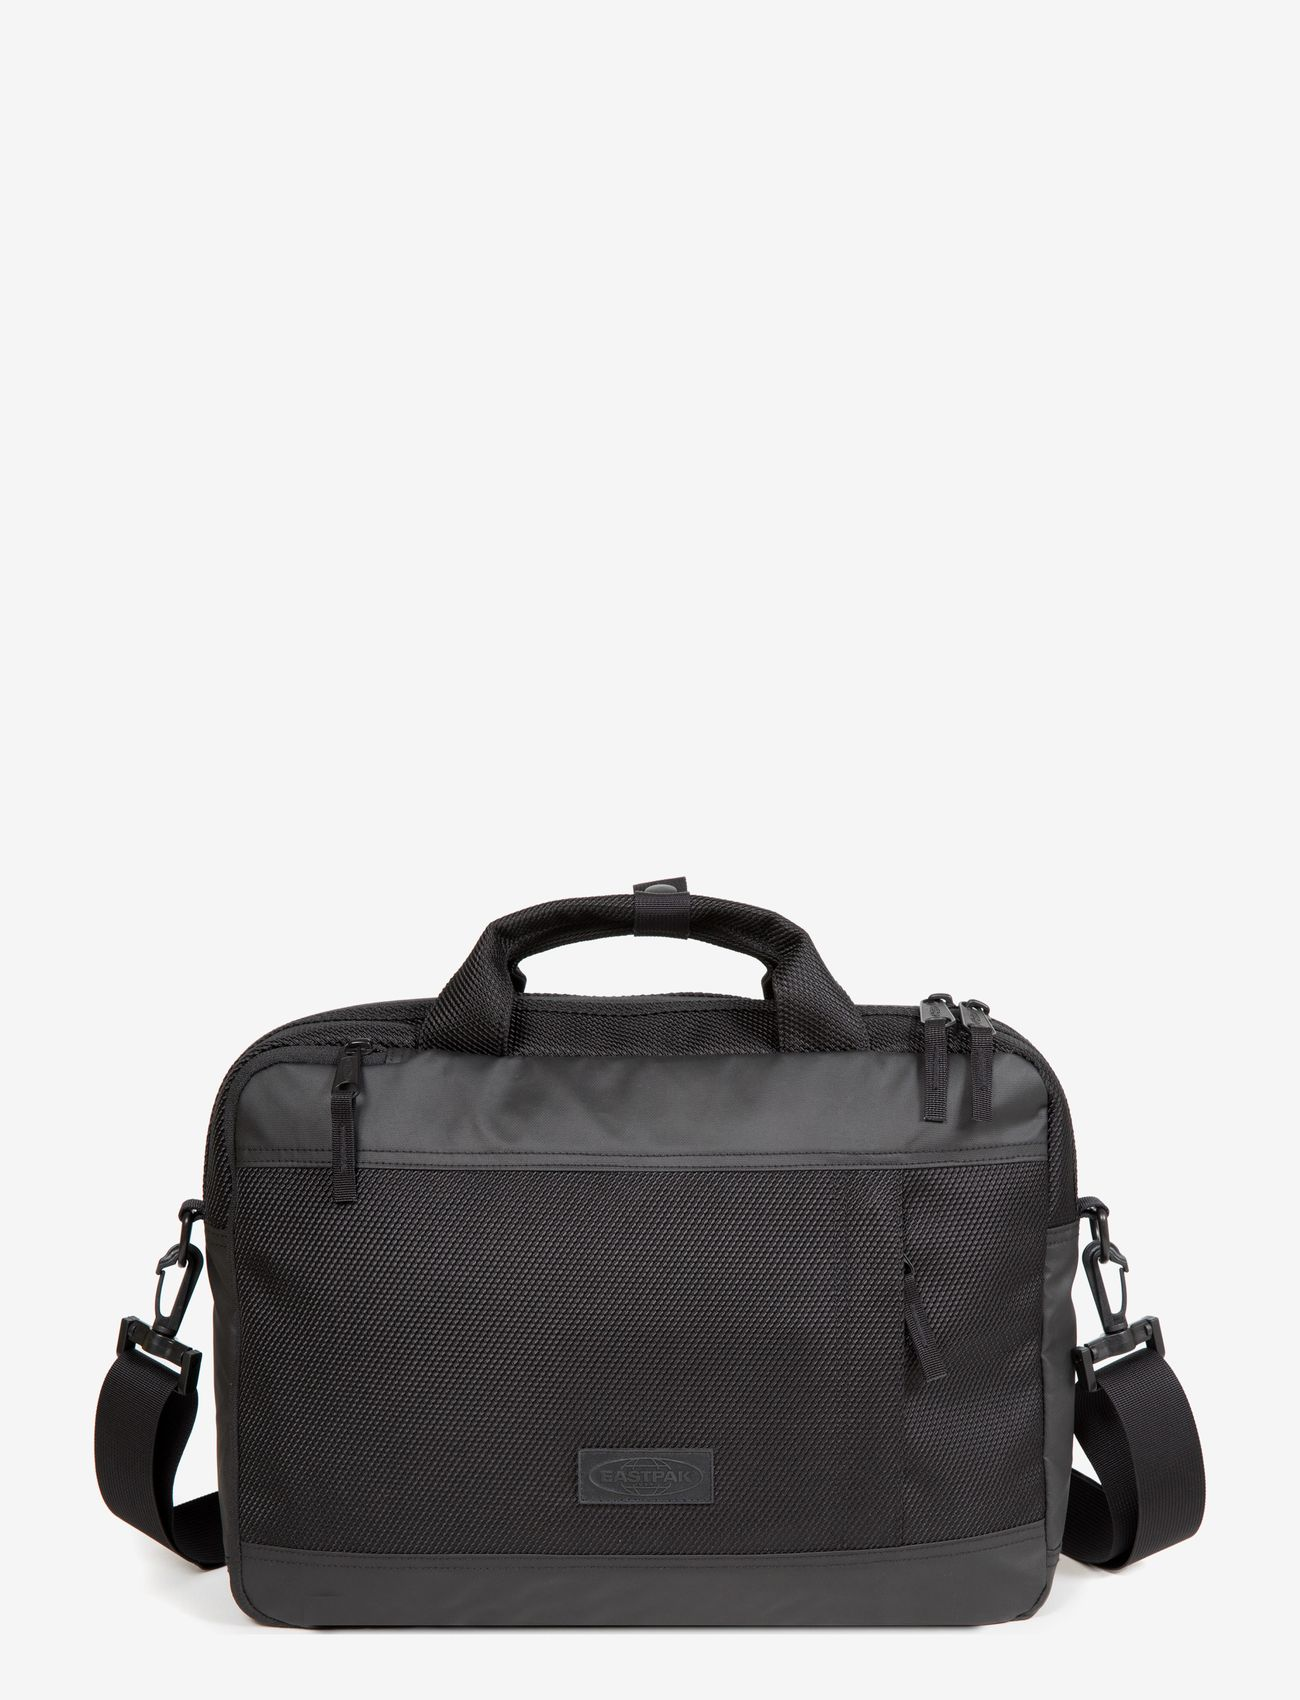 Eastpak - ACTON - laptoptassen - cnnct coat - 0